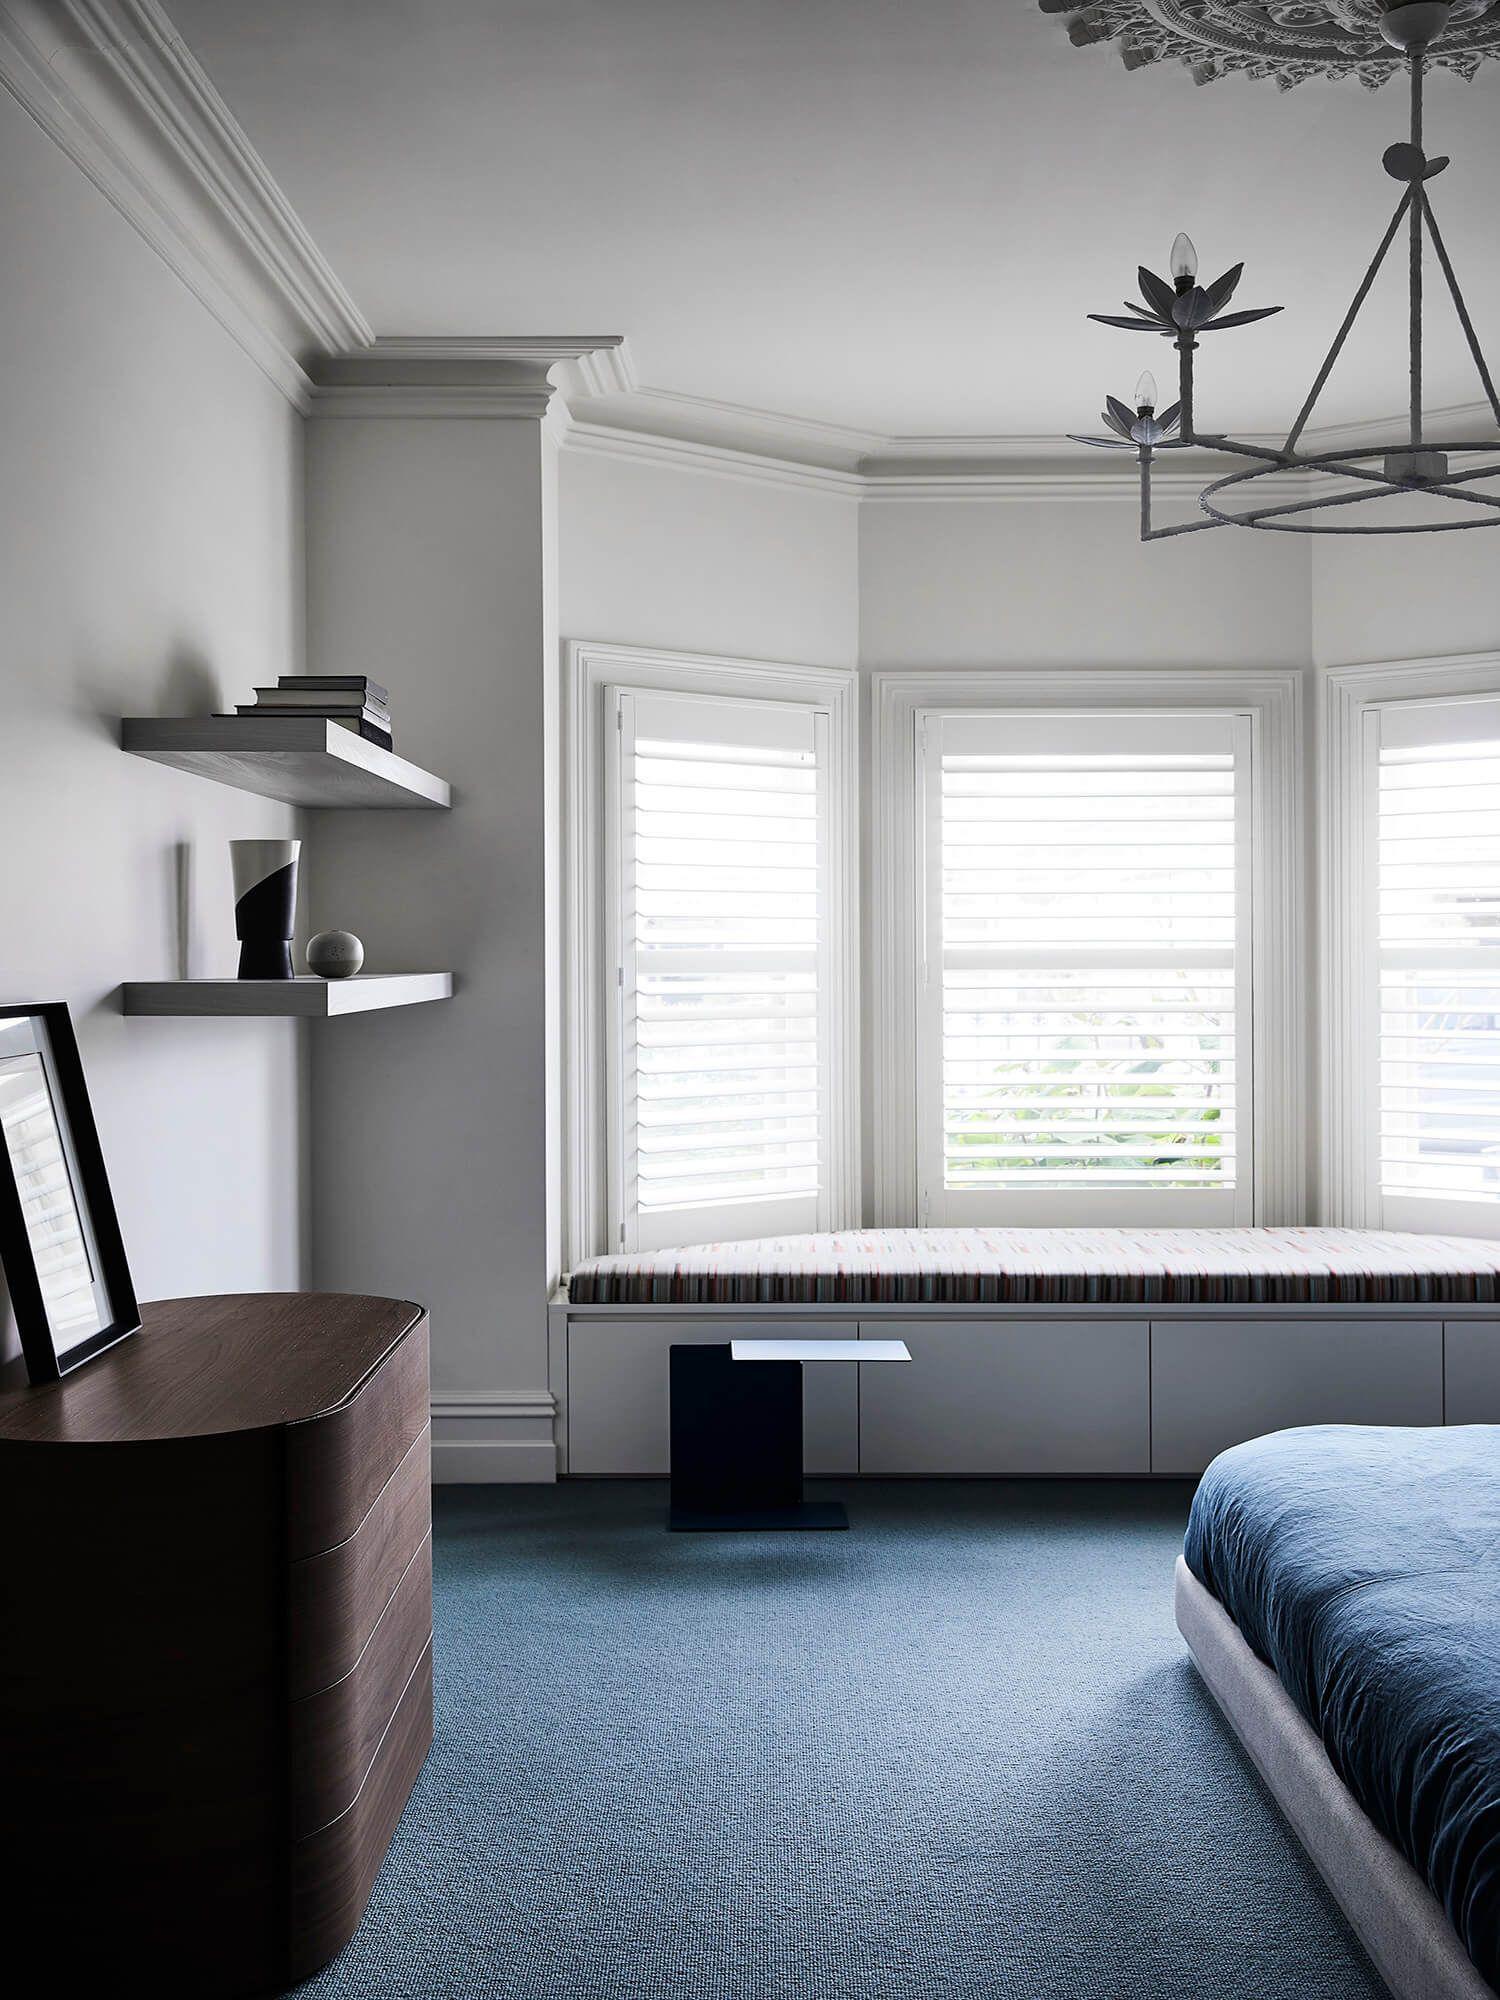 Art decor home decor notes interior design interior decorating bed room